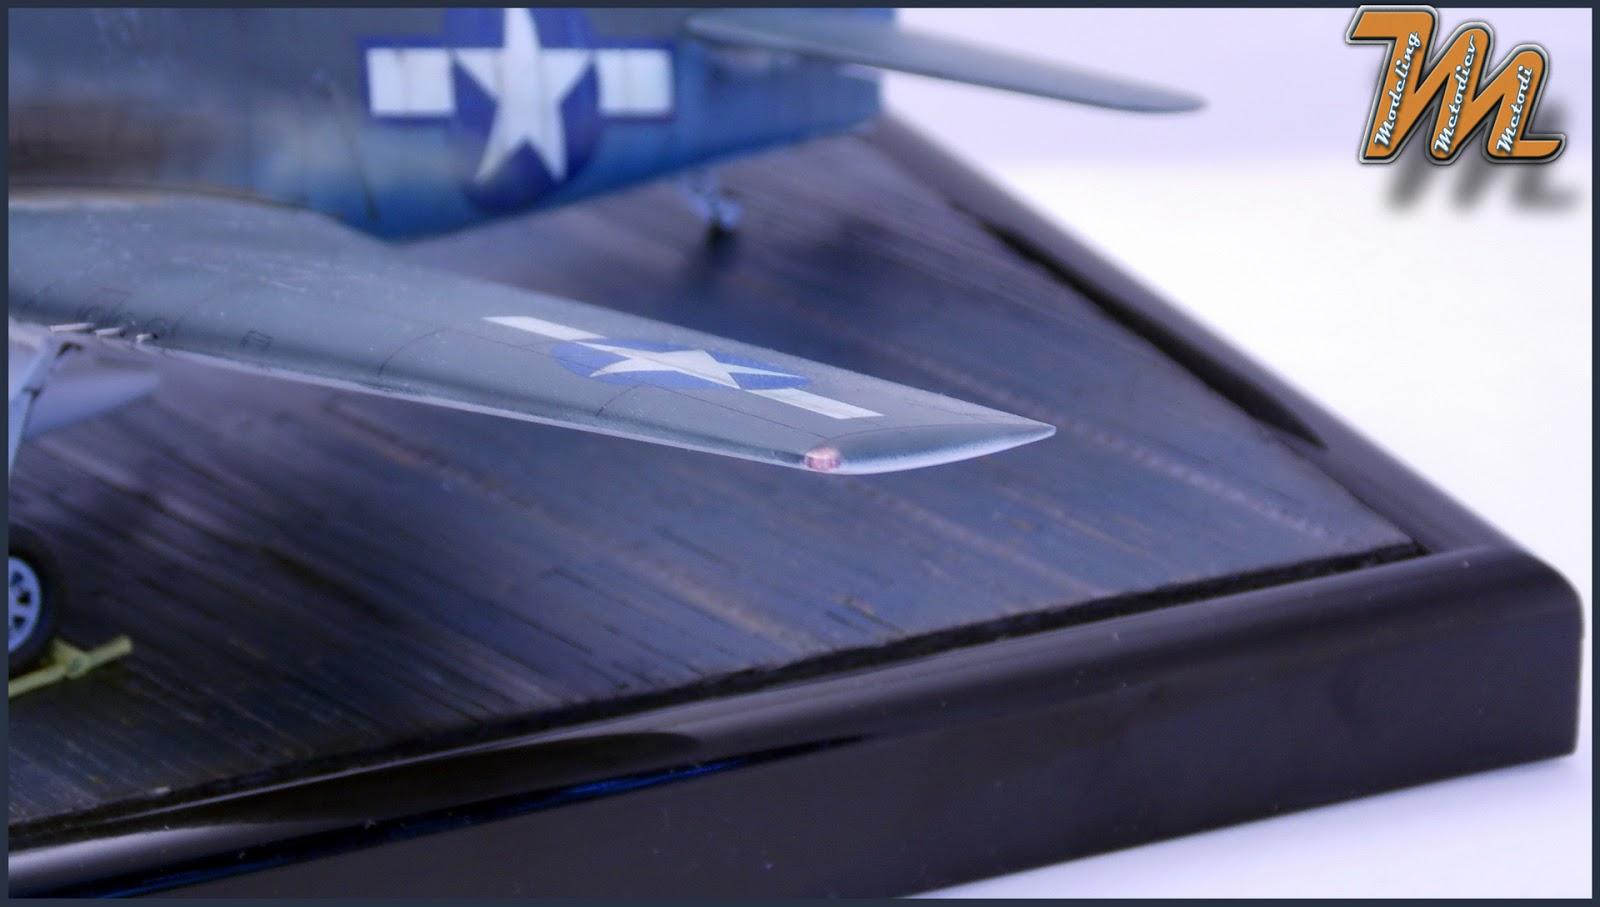 Grumman F6F,USS Princeton, VF27, scale model